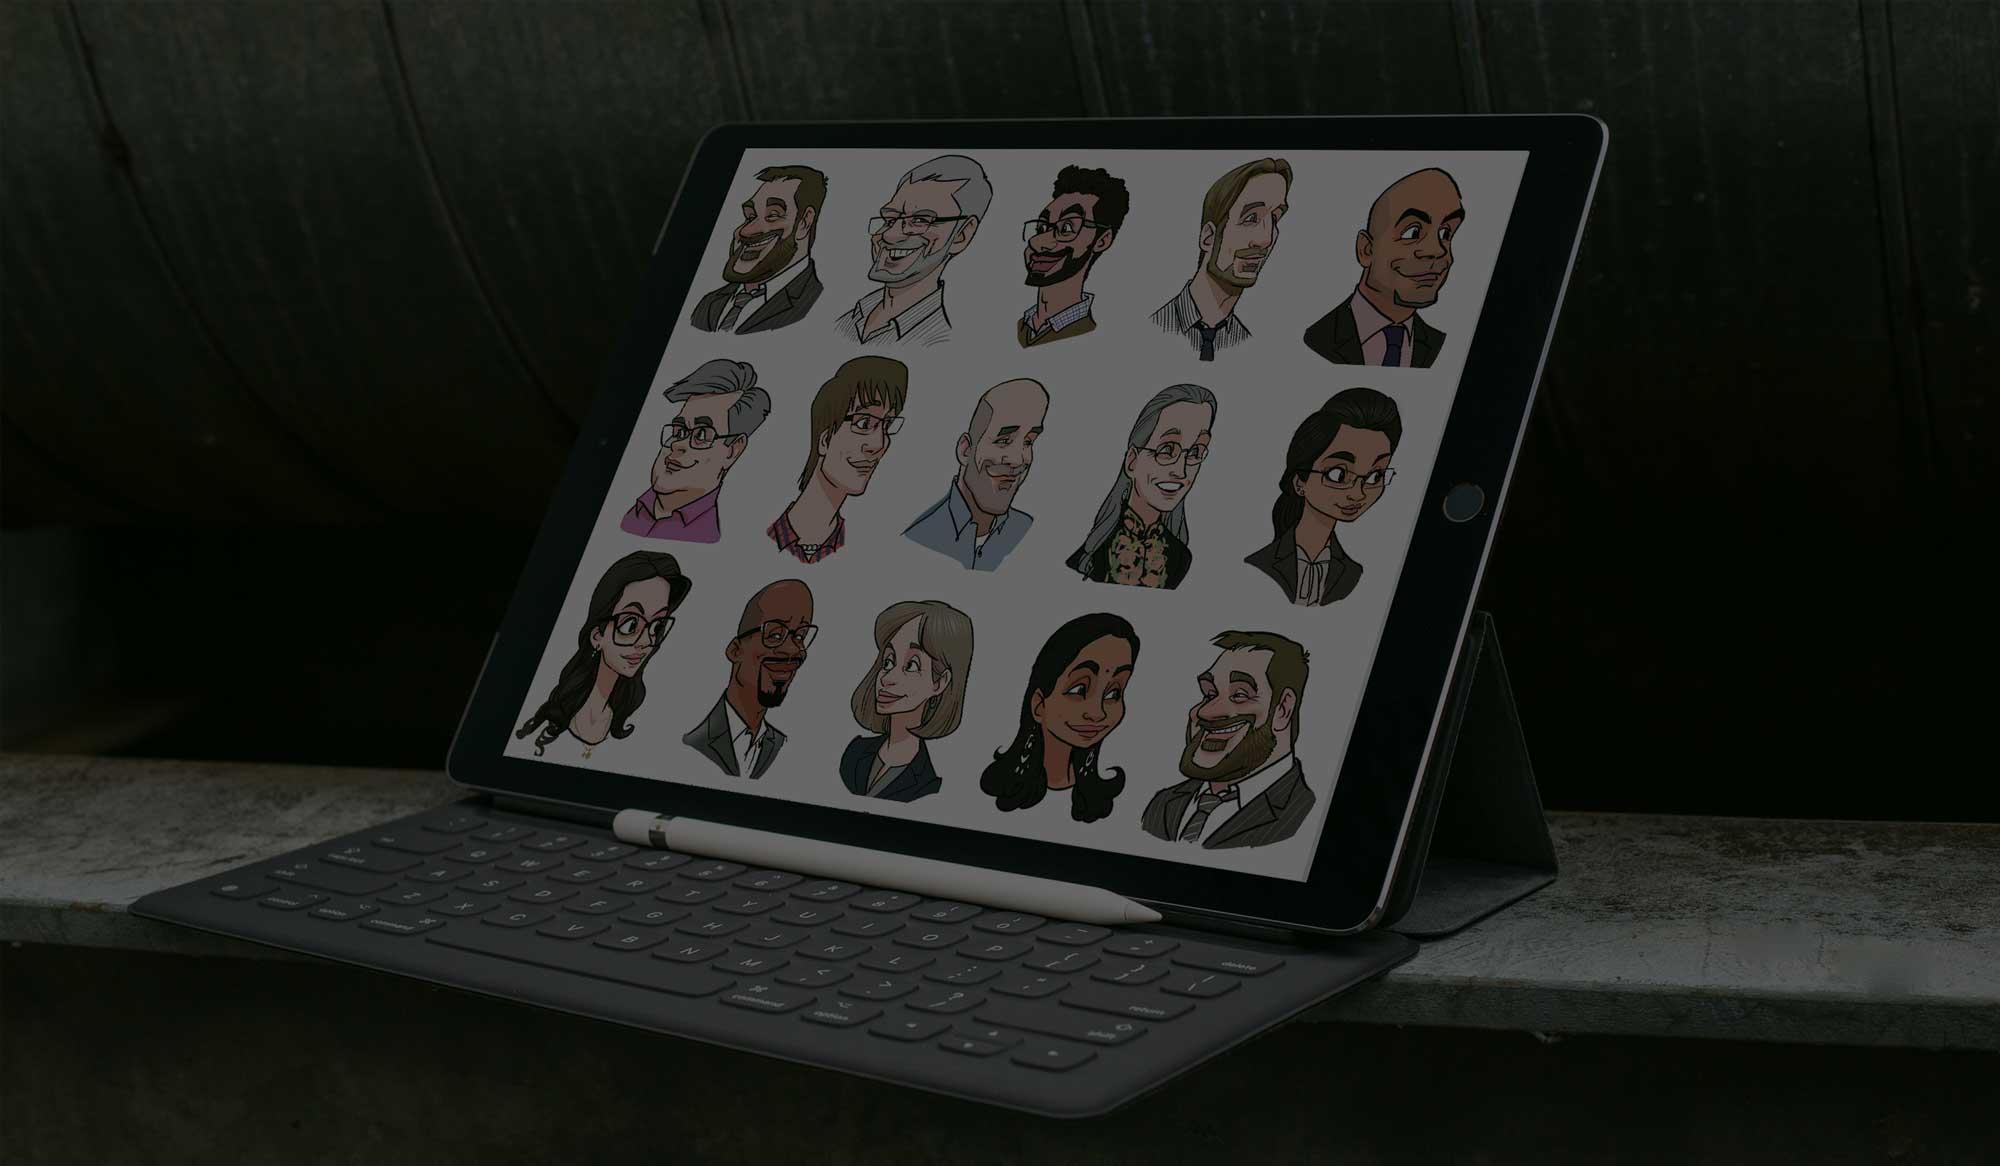 Professional Digital Caricaturist in Vienna for Hire